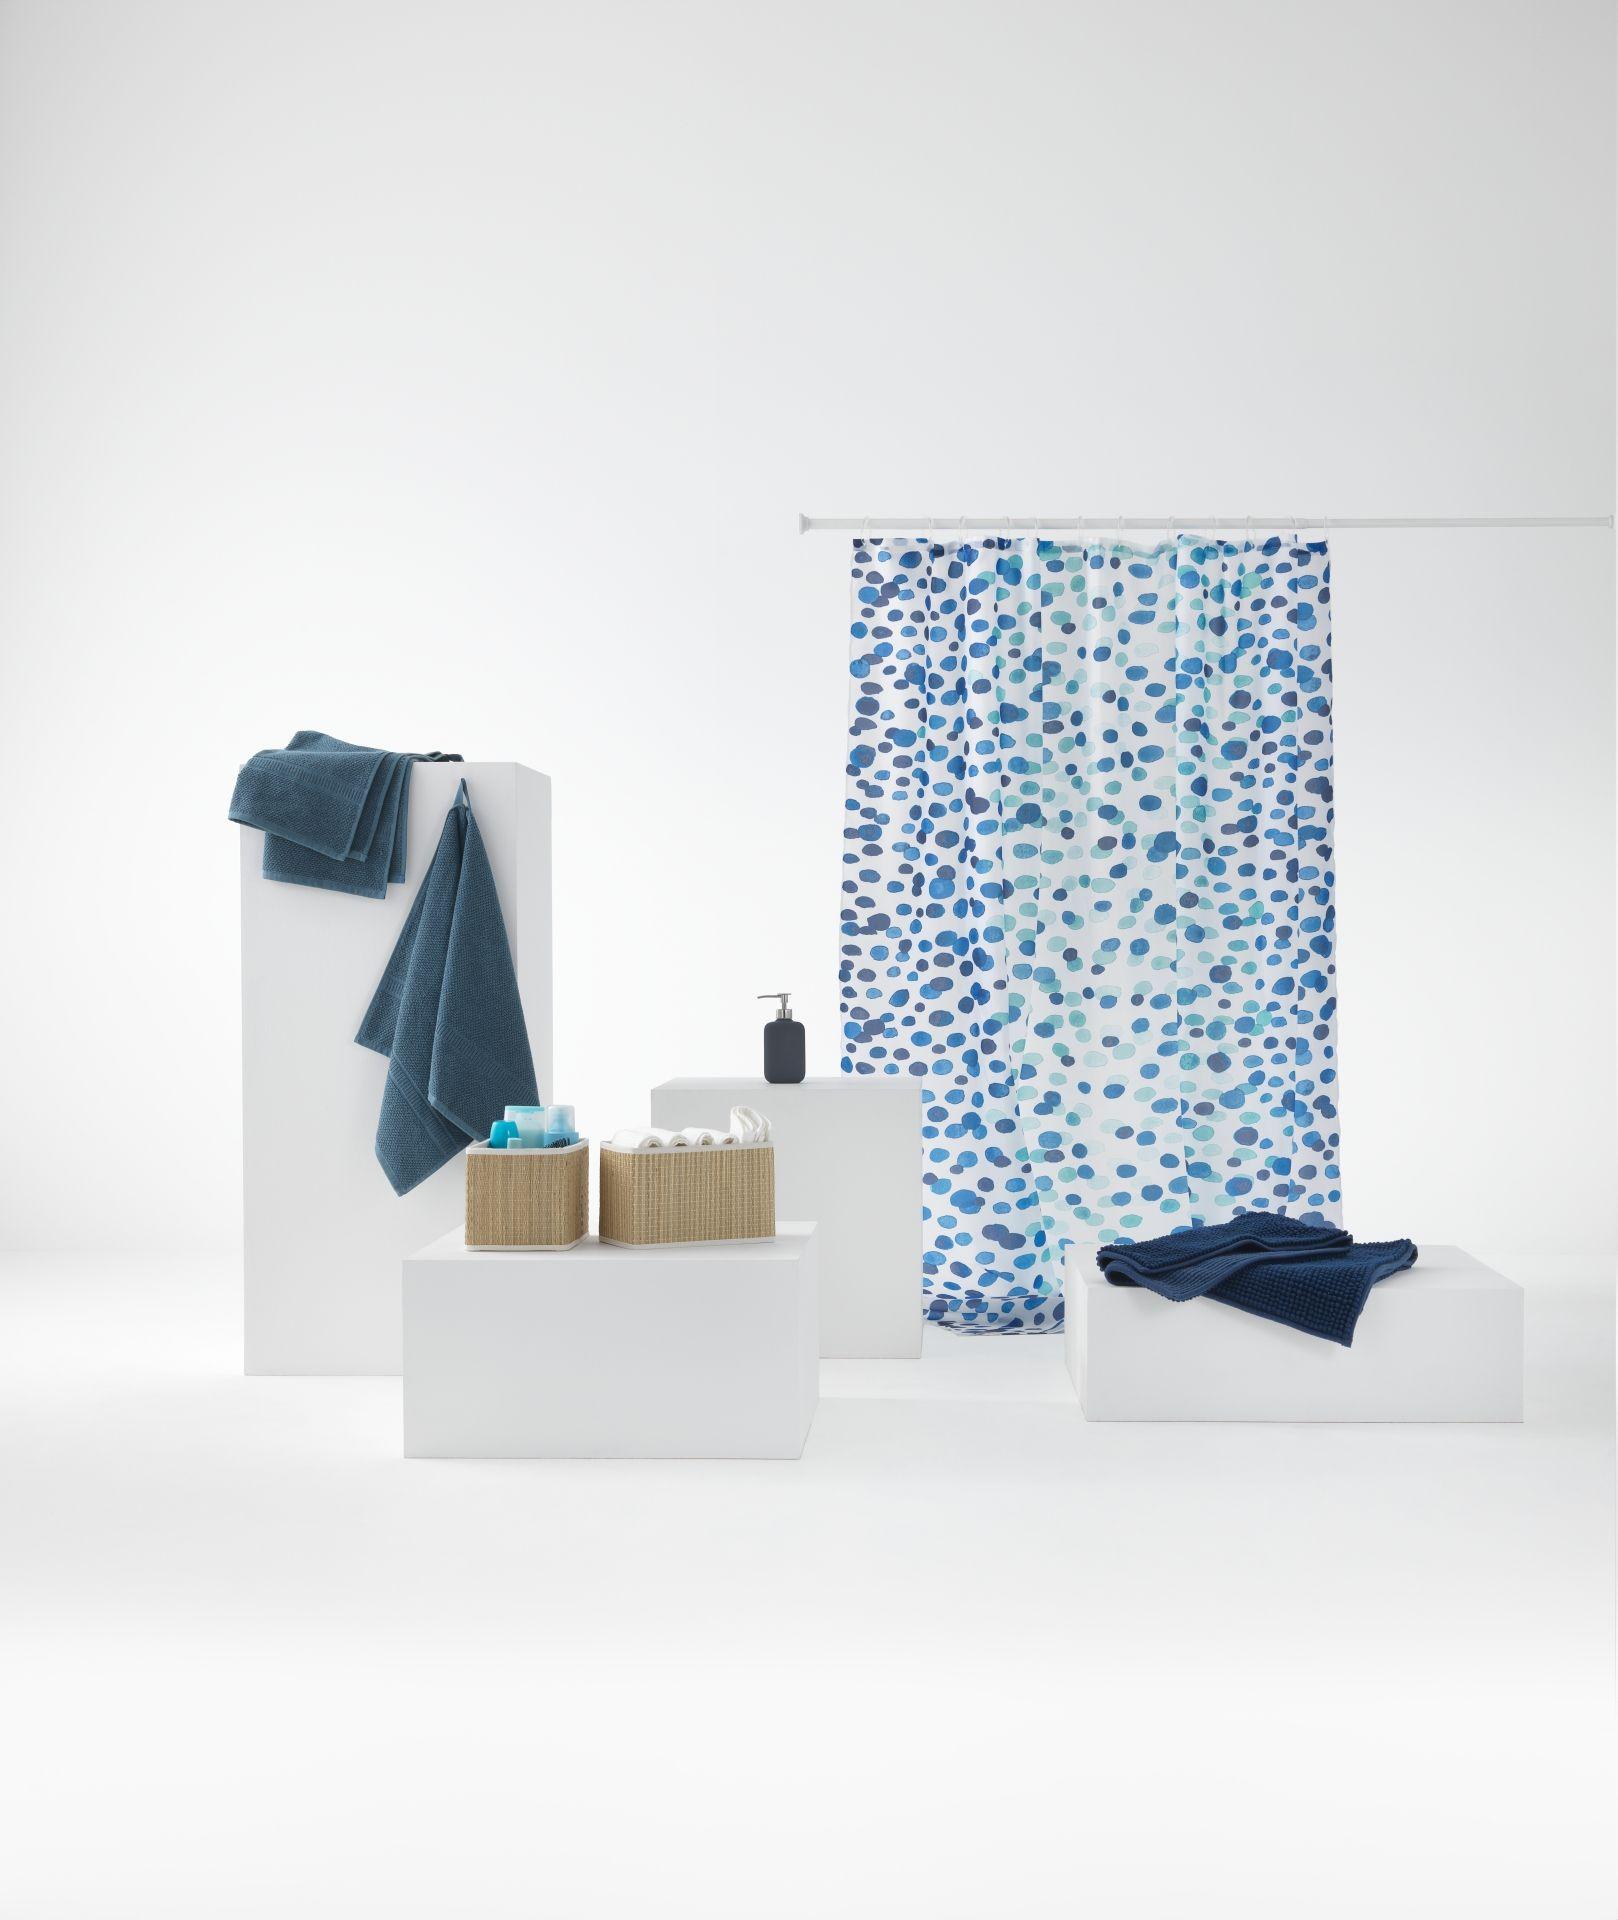 FRÄJEN handdoek   IKEAcatalogus nieuw 2018 IKEA IKEAnl IKEAnederland ...